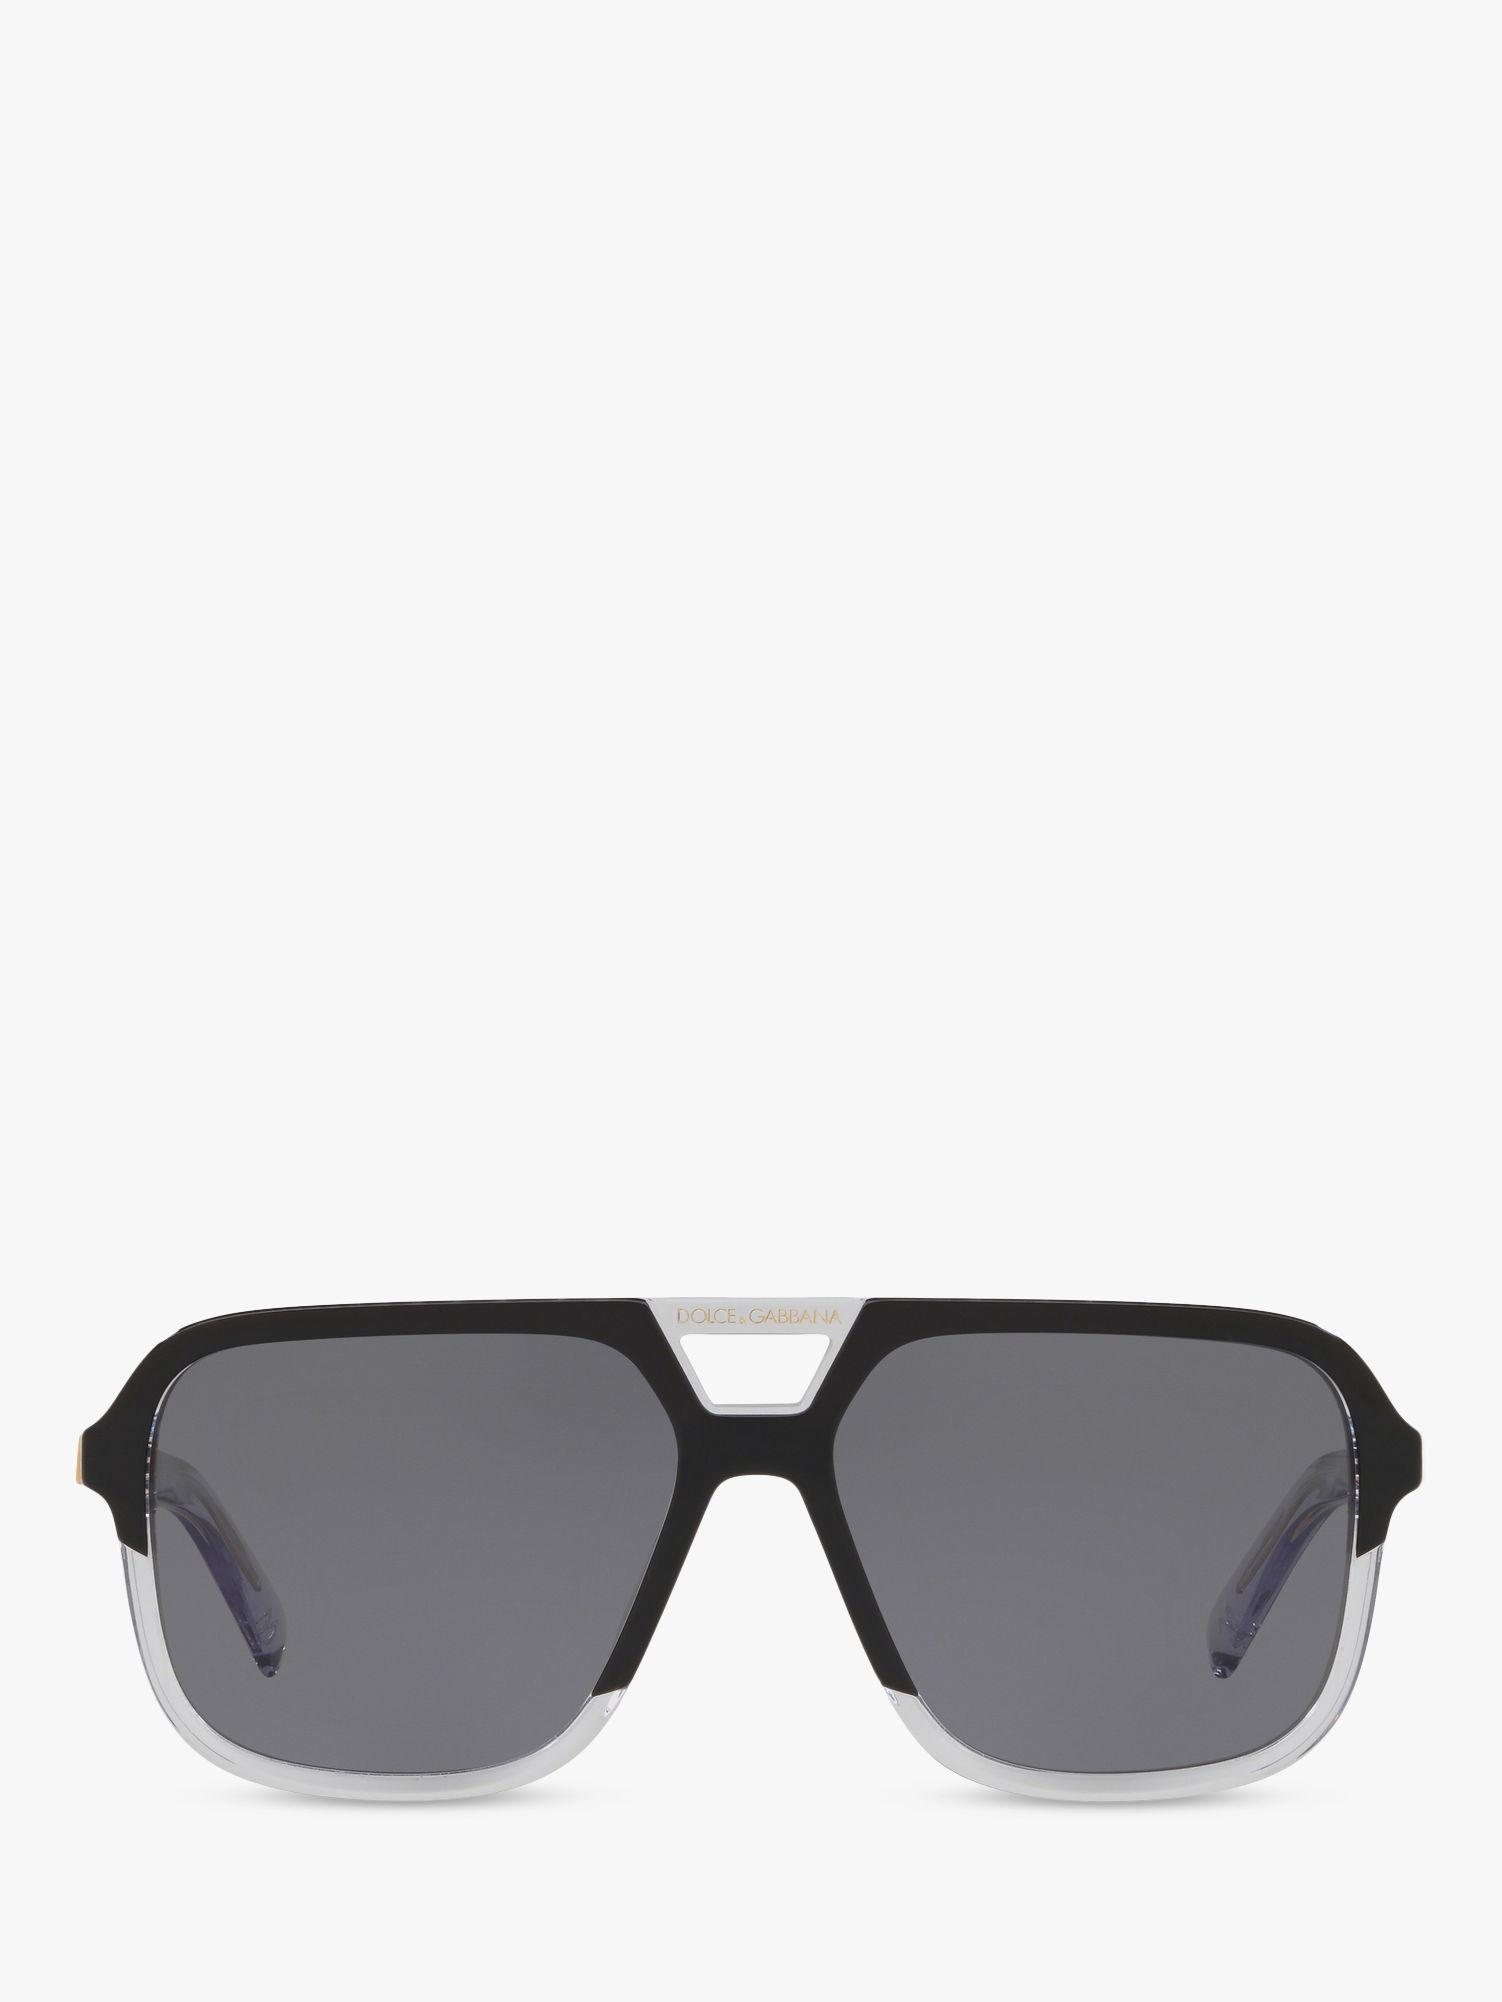 01282081cfe7a Dolce   Gabbana Dg4354 Men s Polarised Square Sunglasses in Black ...